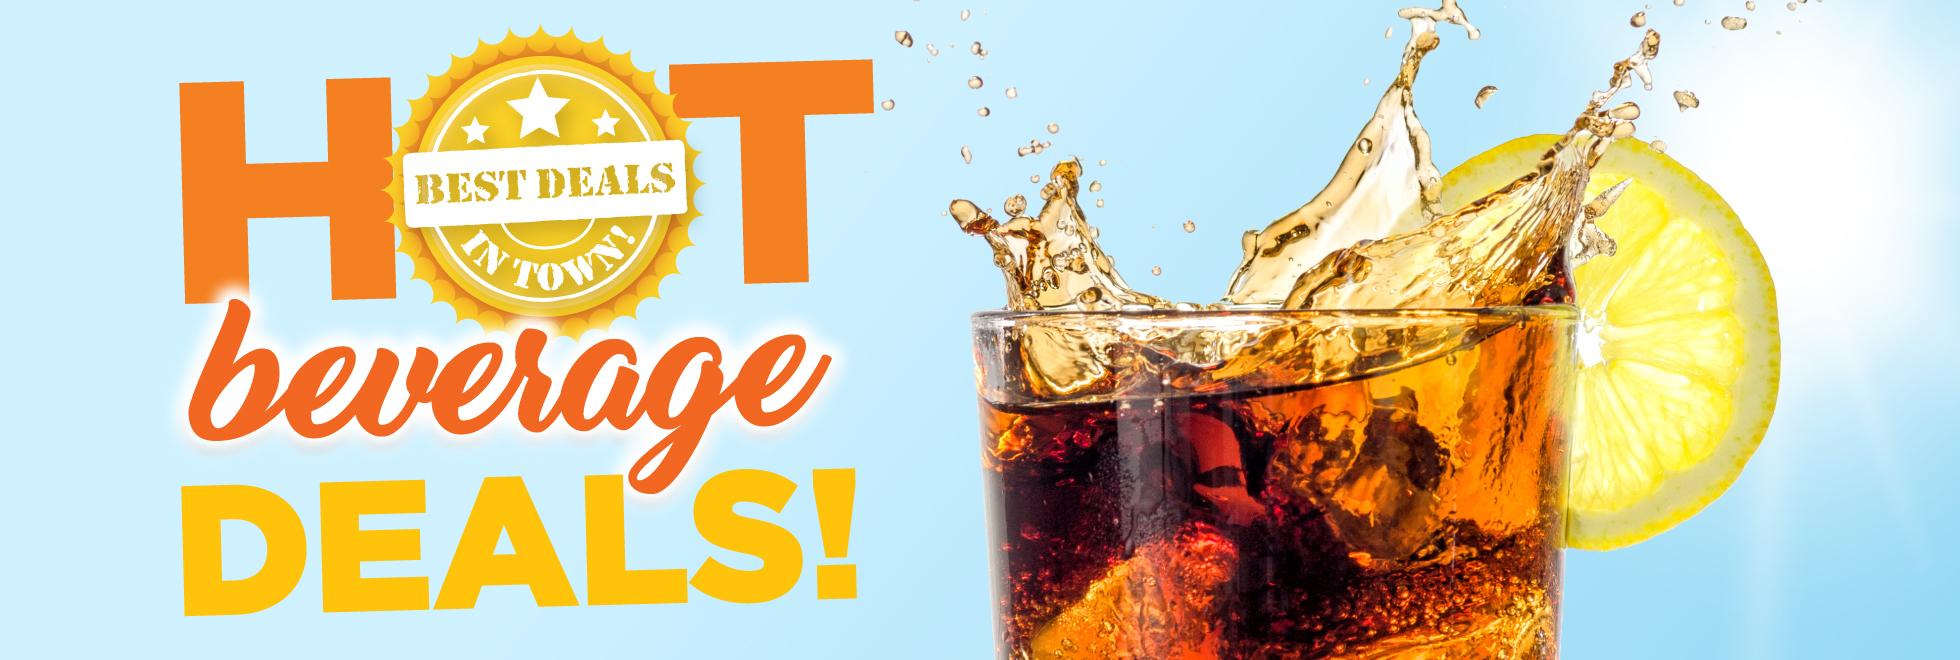 Hot Beverage Deals